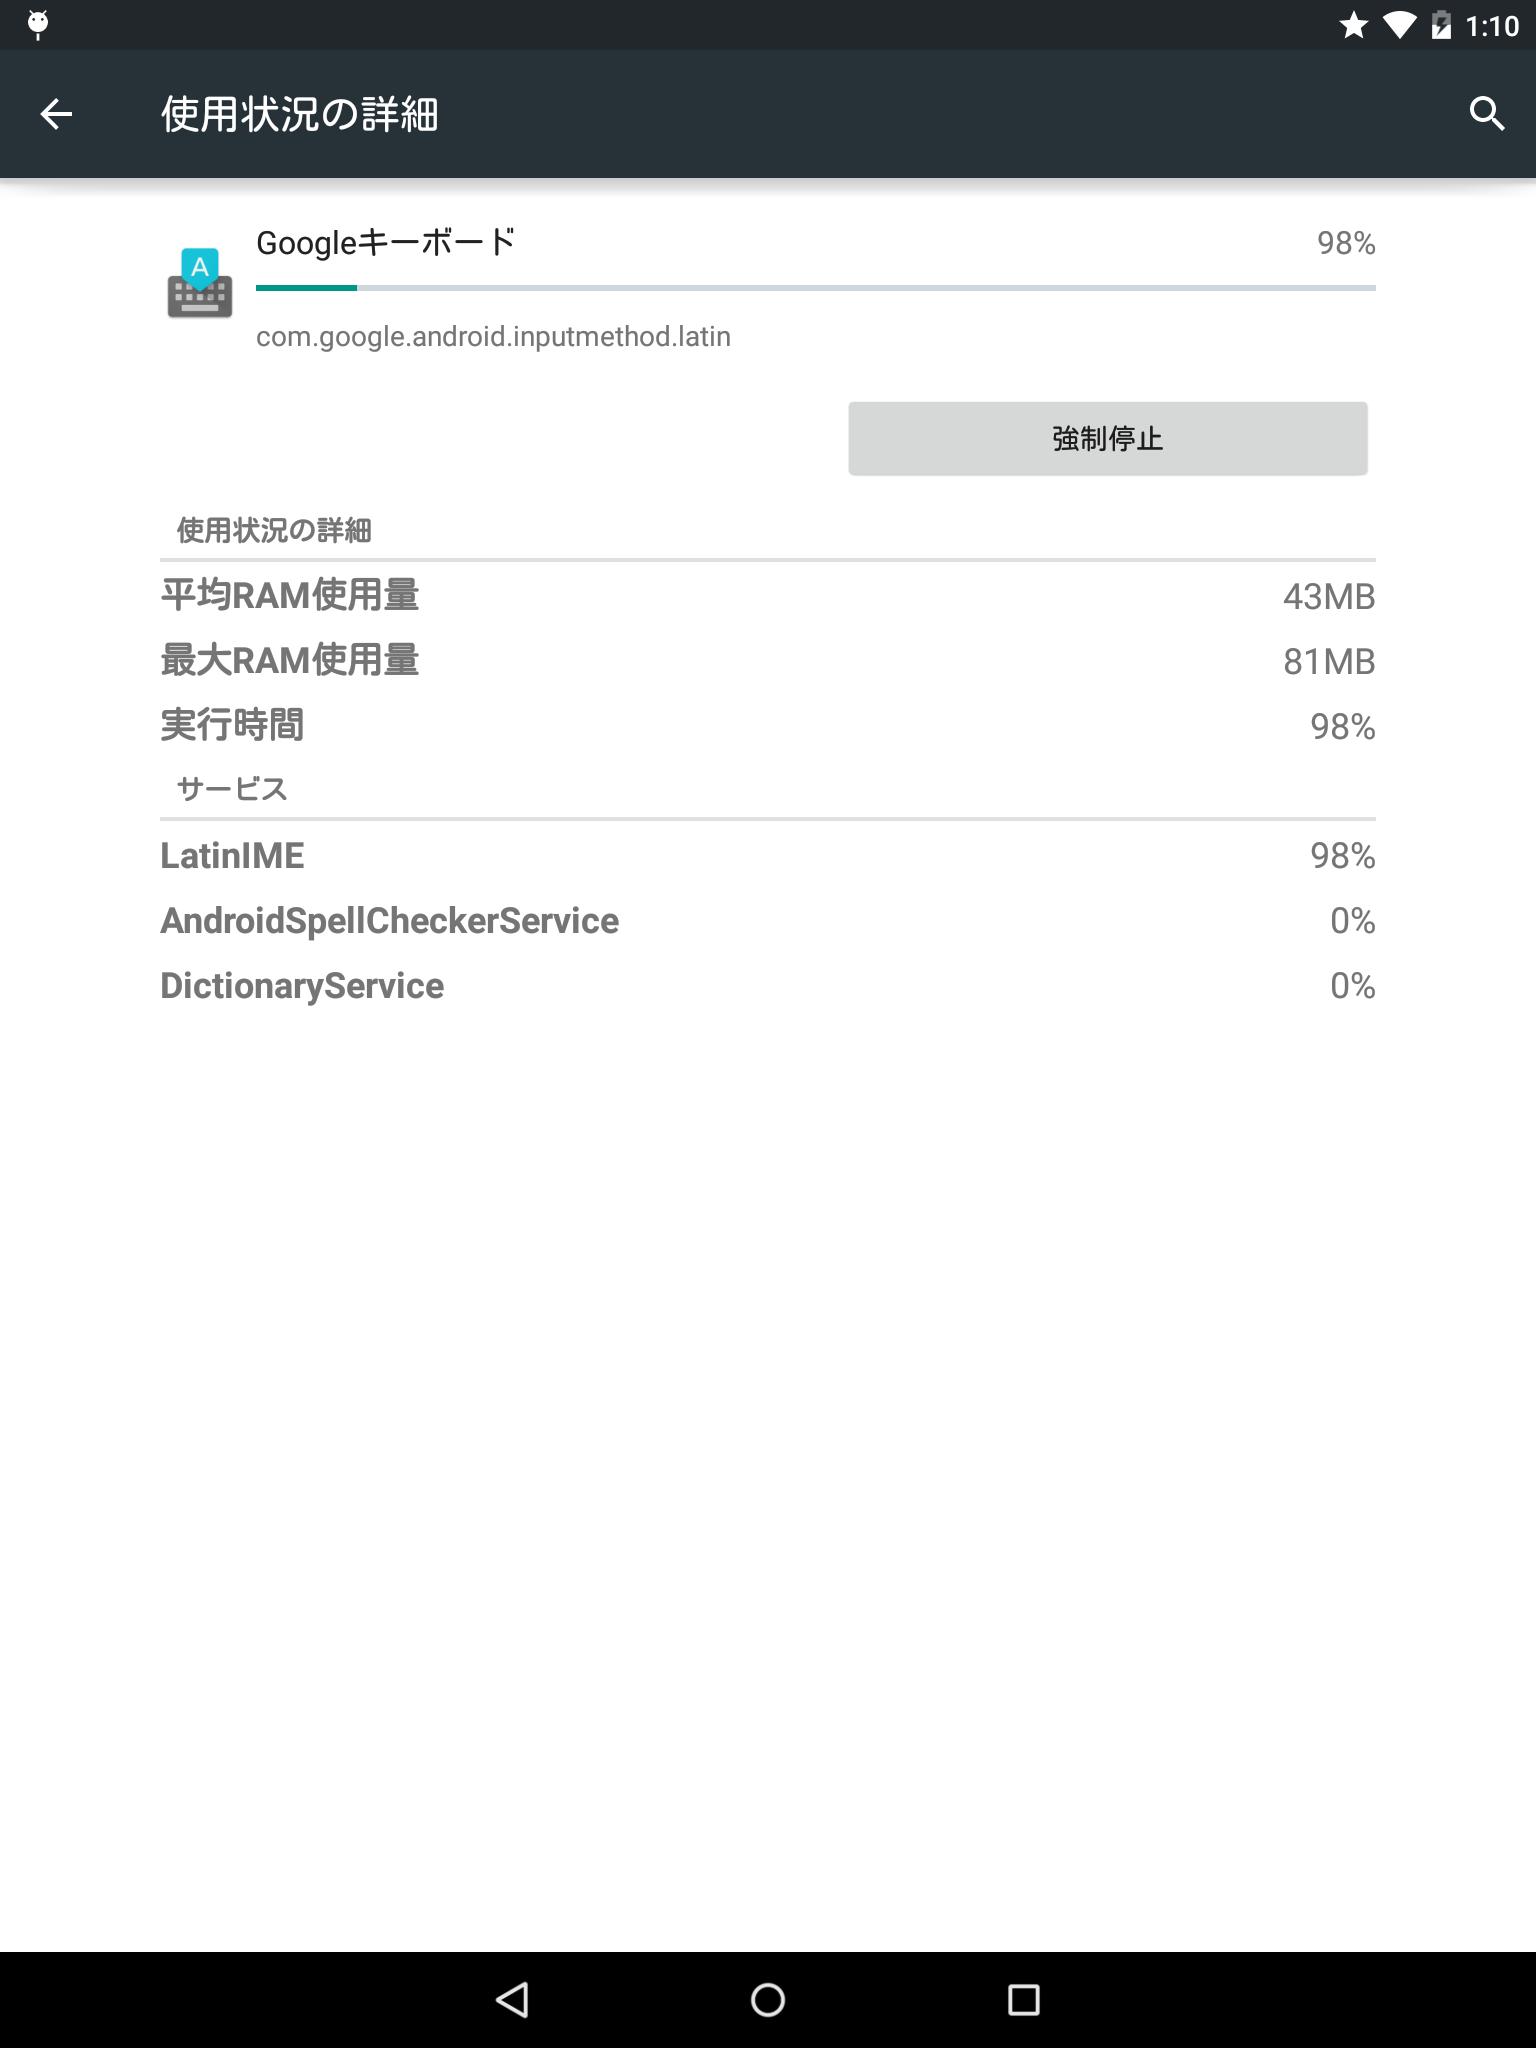 device-2014-11-07-011101_使用状況の詳細